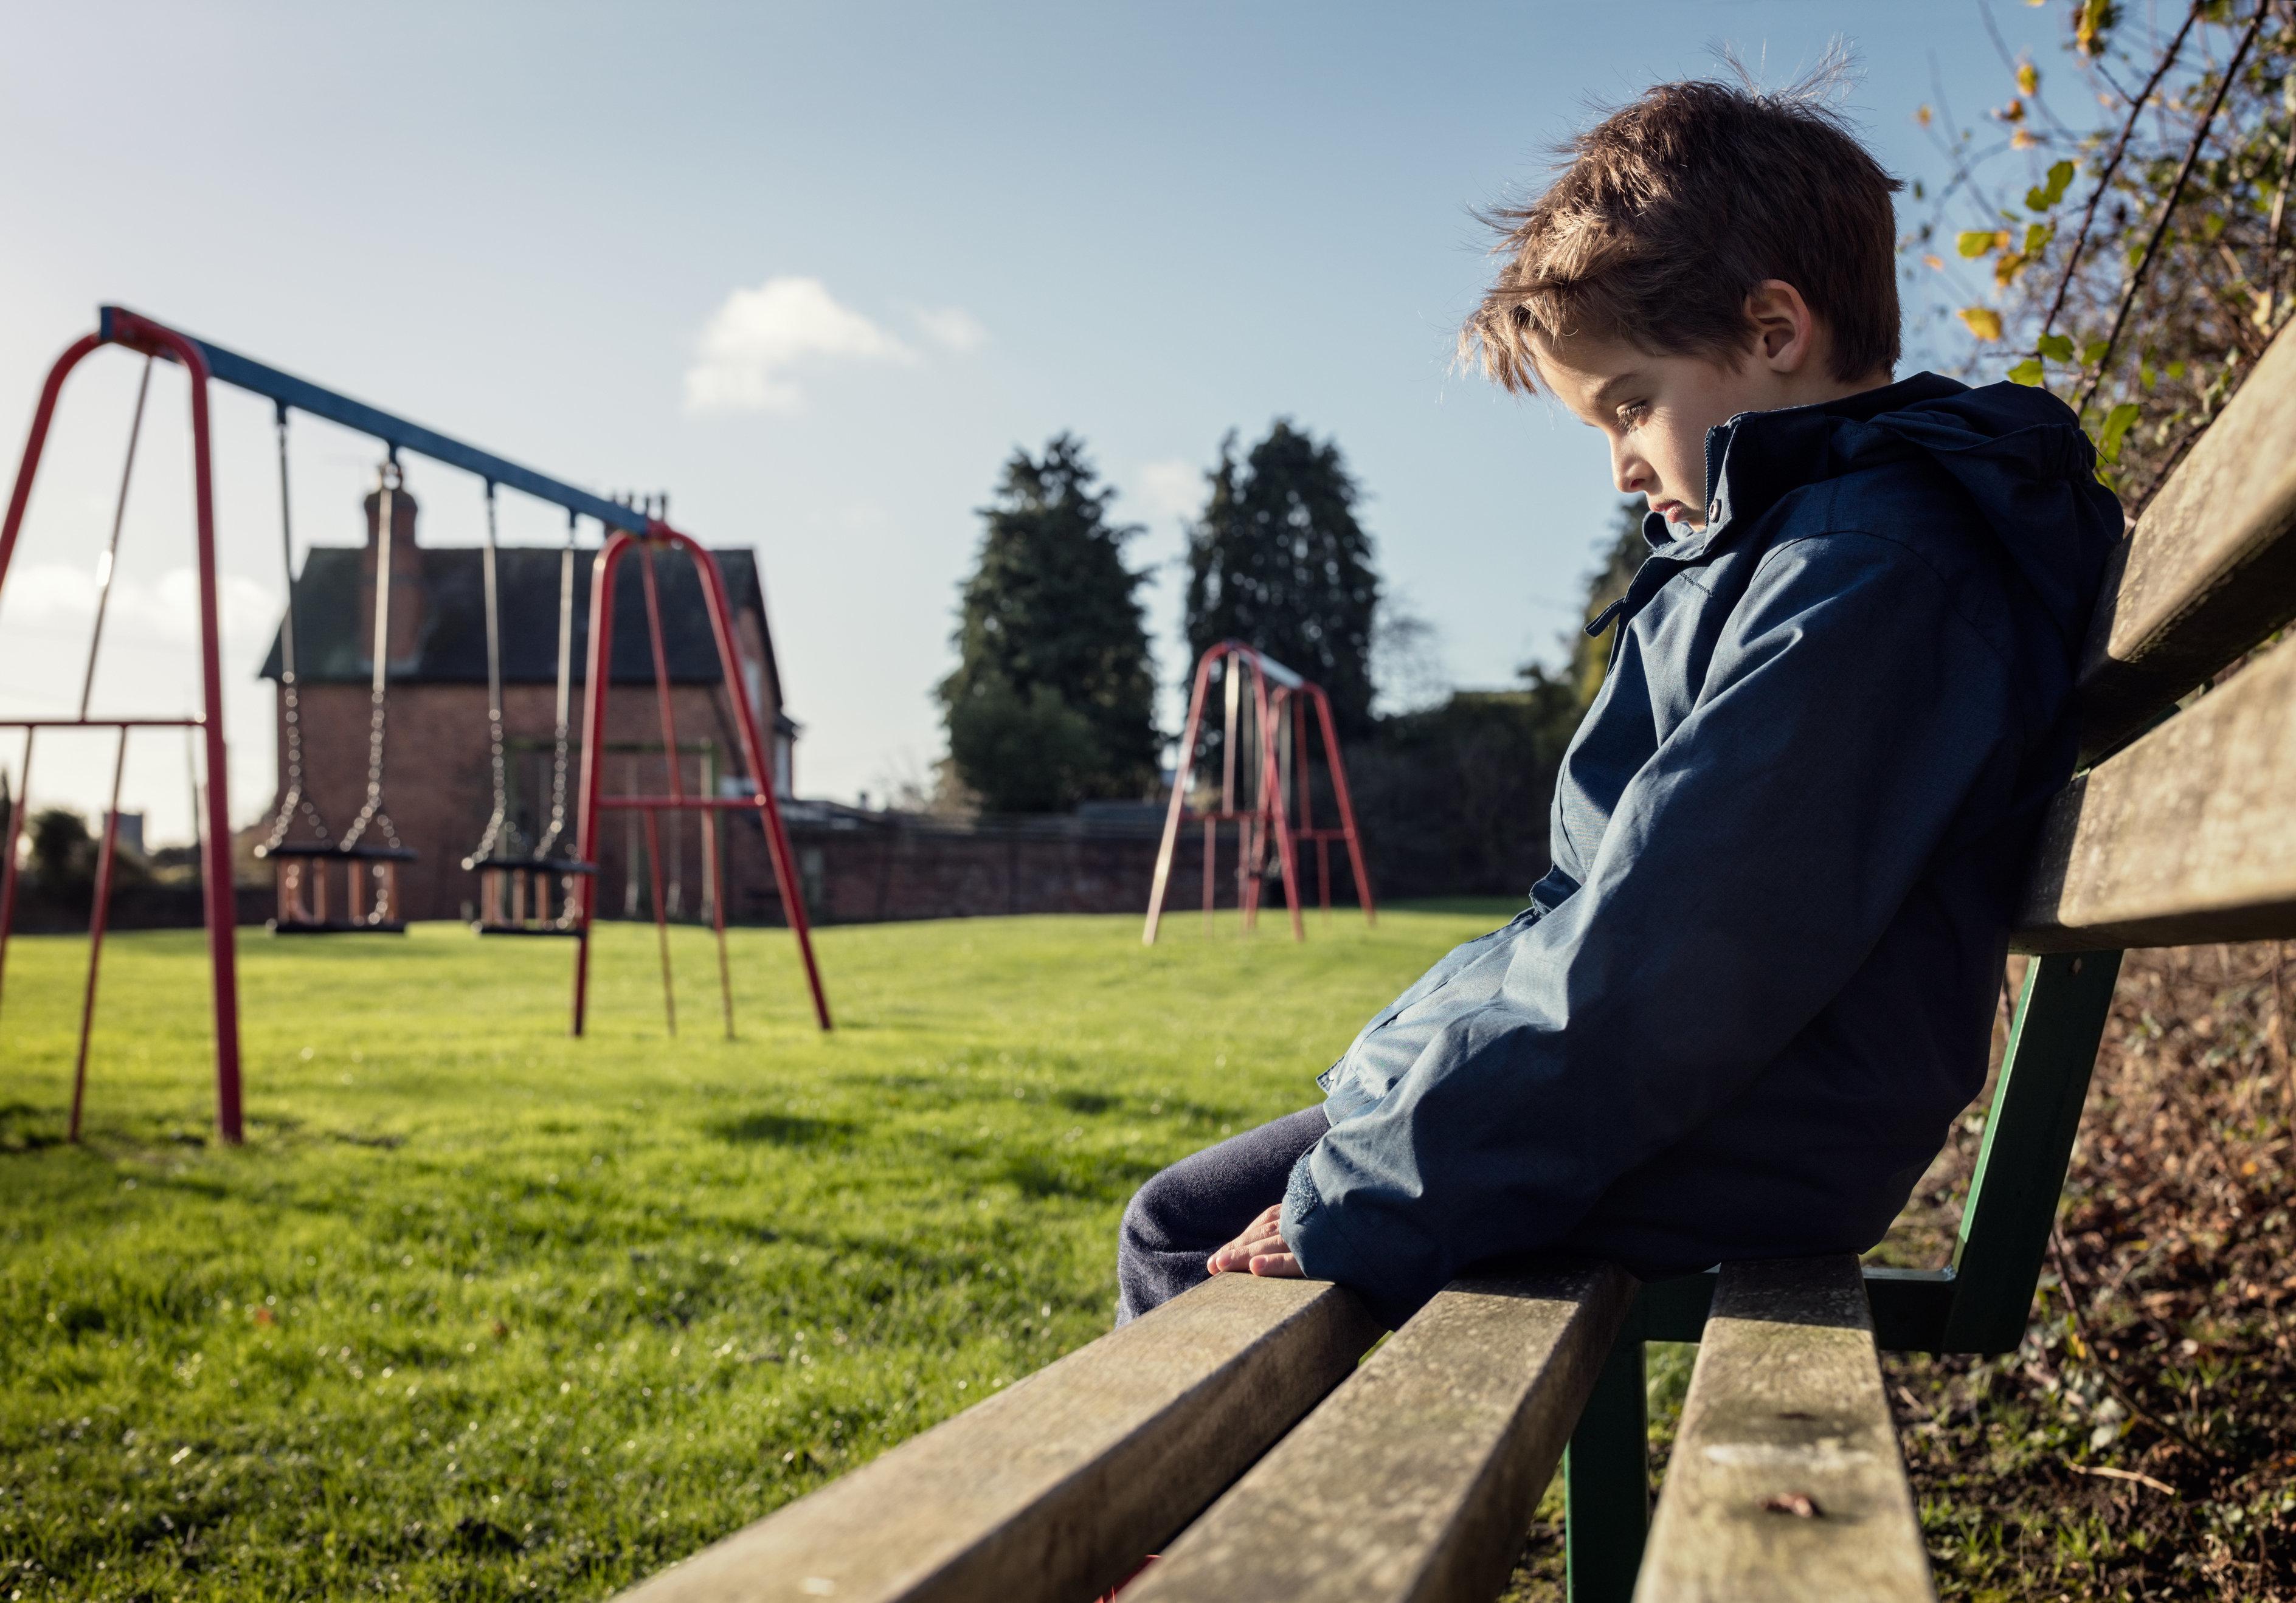 Barnardo's Boss Warns Of 'Perfect Storm' In Children's Social